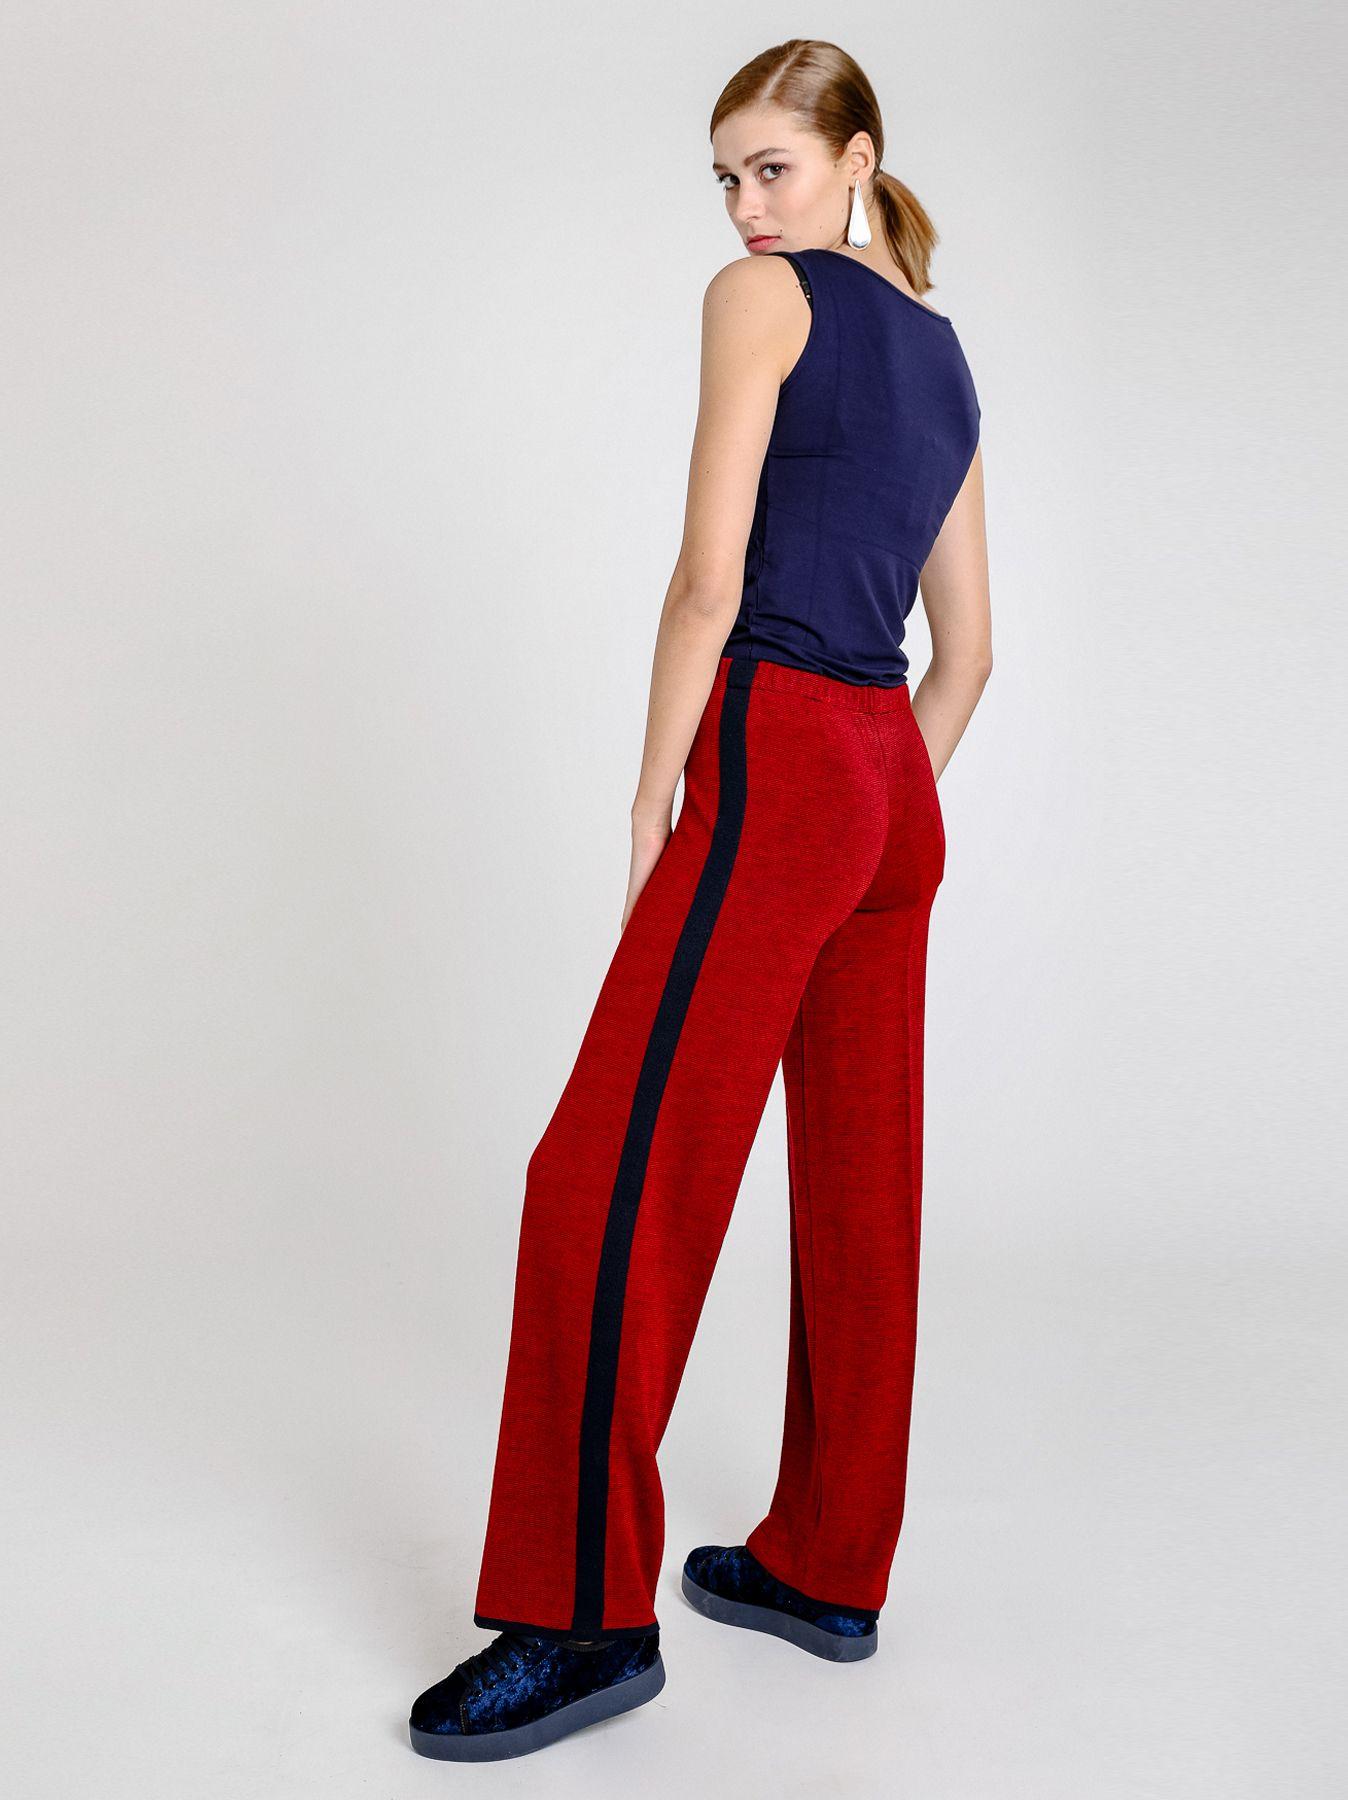 Pantalone con banda